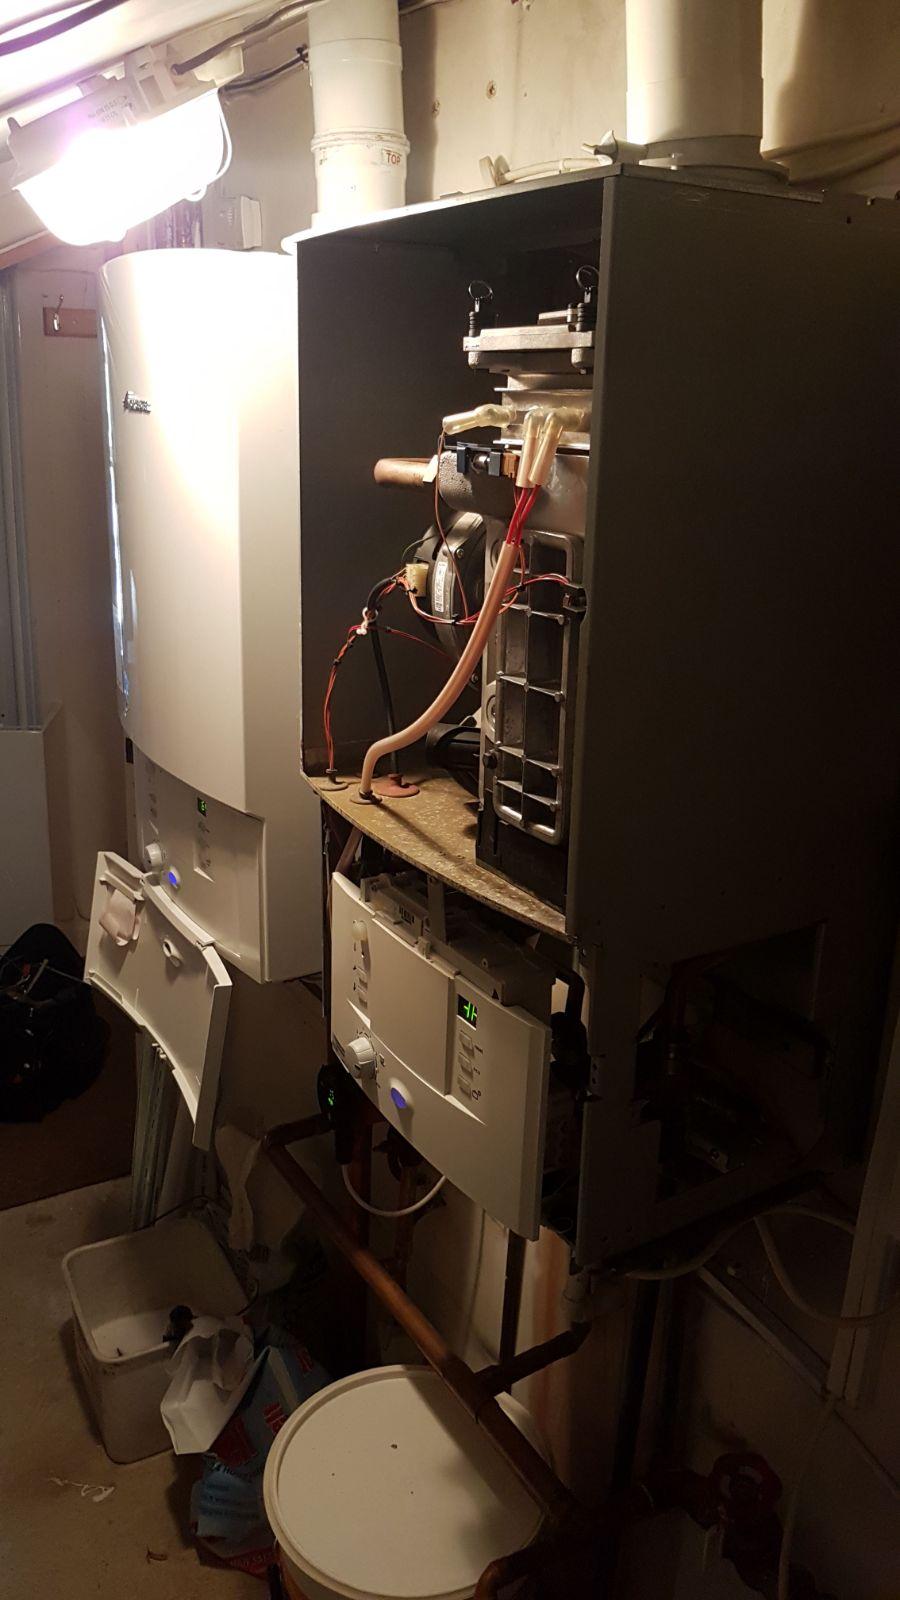 boiler pic eastfield surgery boiler open 2.jpg